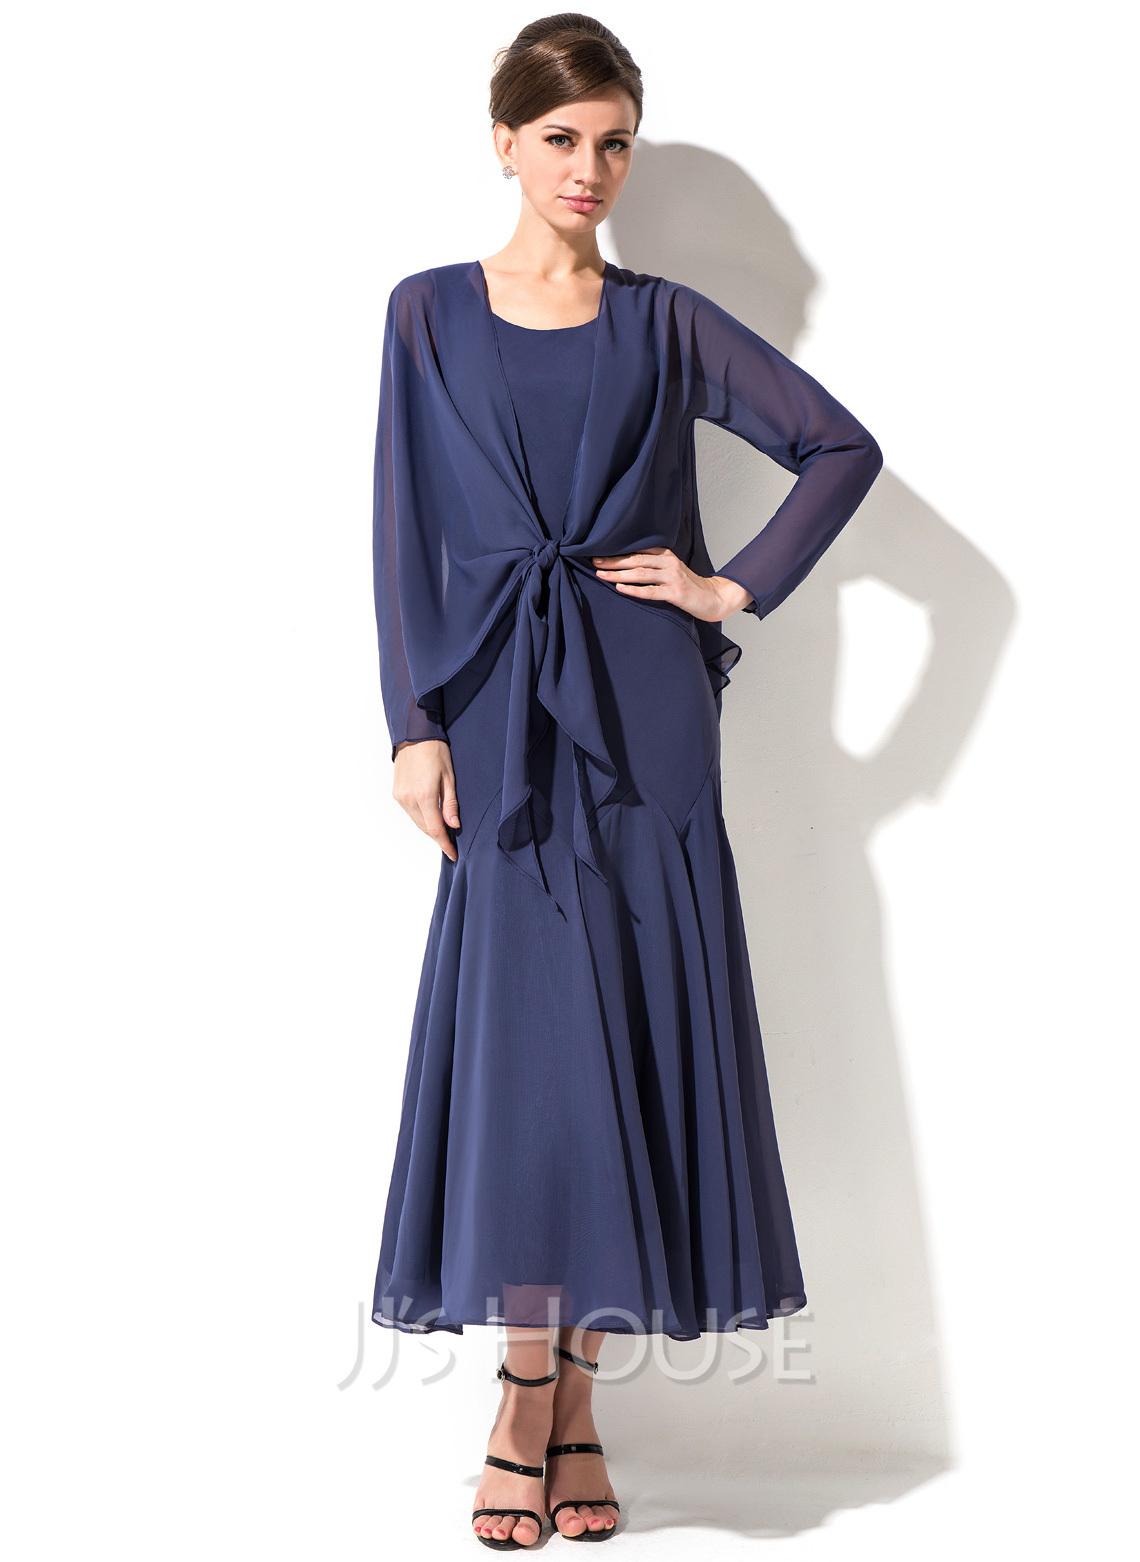 Trumpet/Mermaid Scoop Neck Tea-Length Chiffon Mother of the Bride Dress